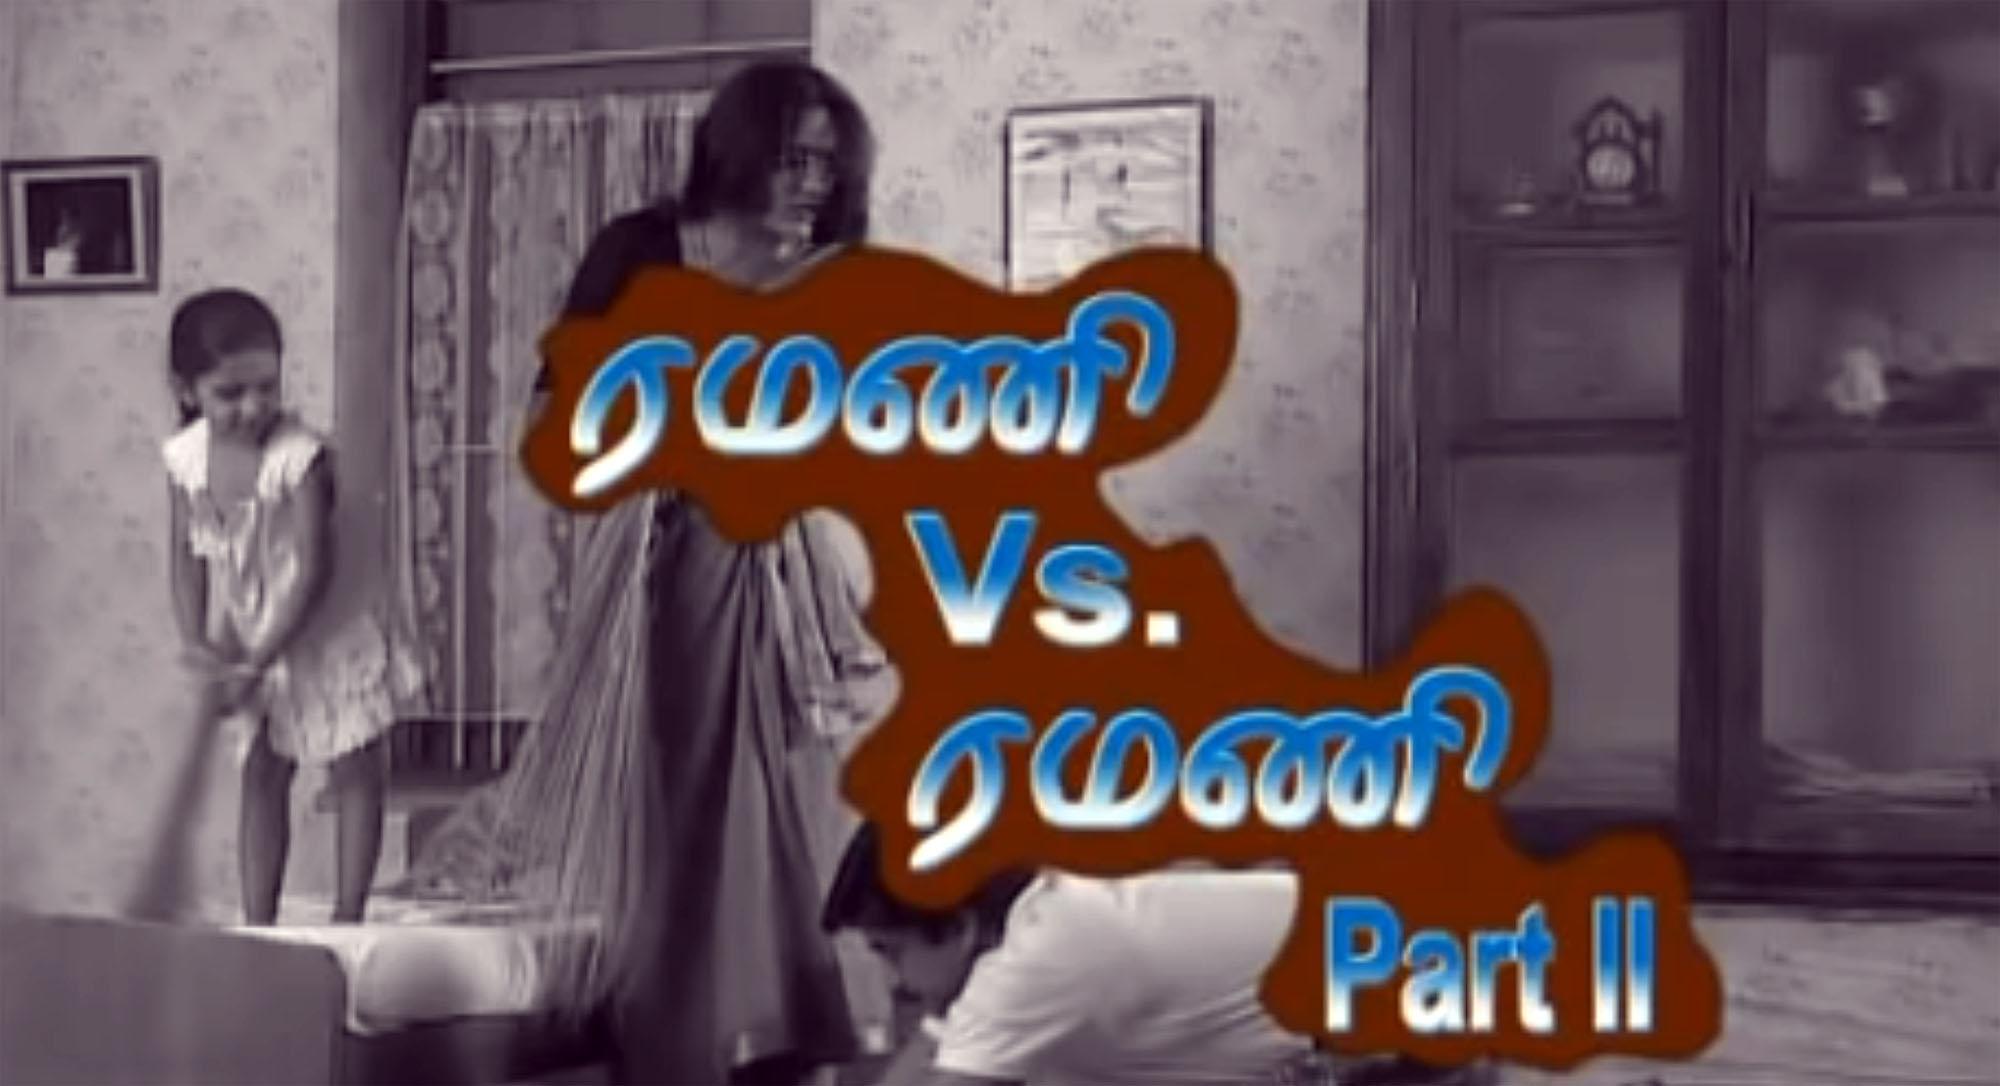 ரமணி vs ரமணி